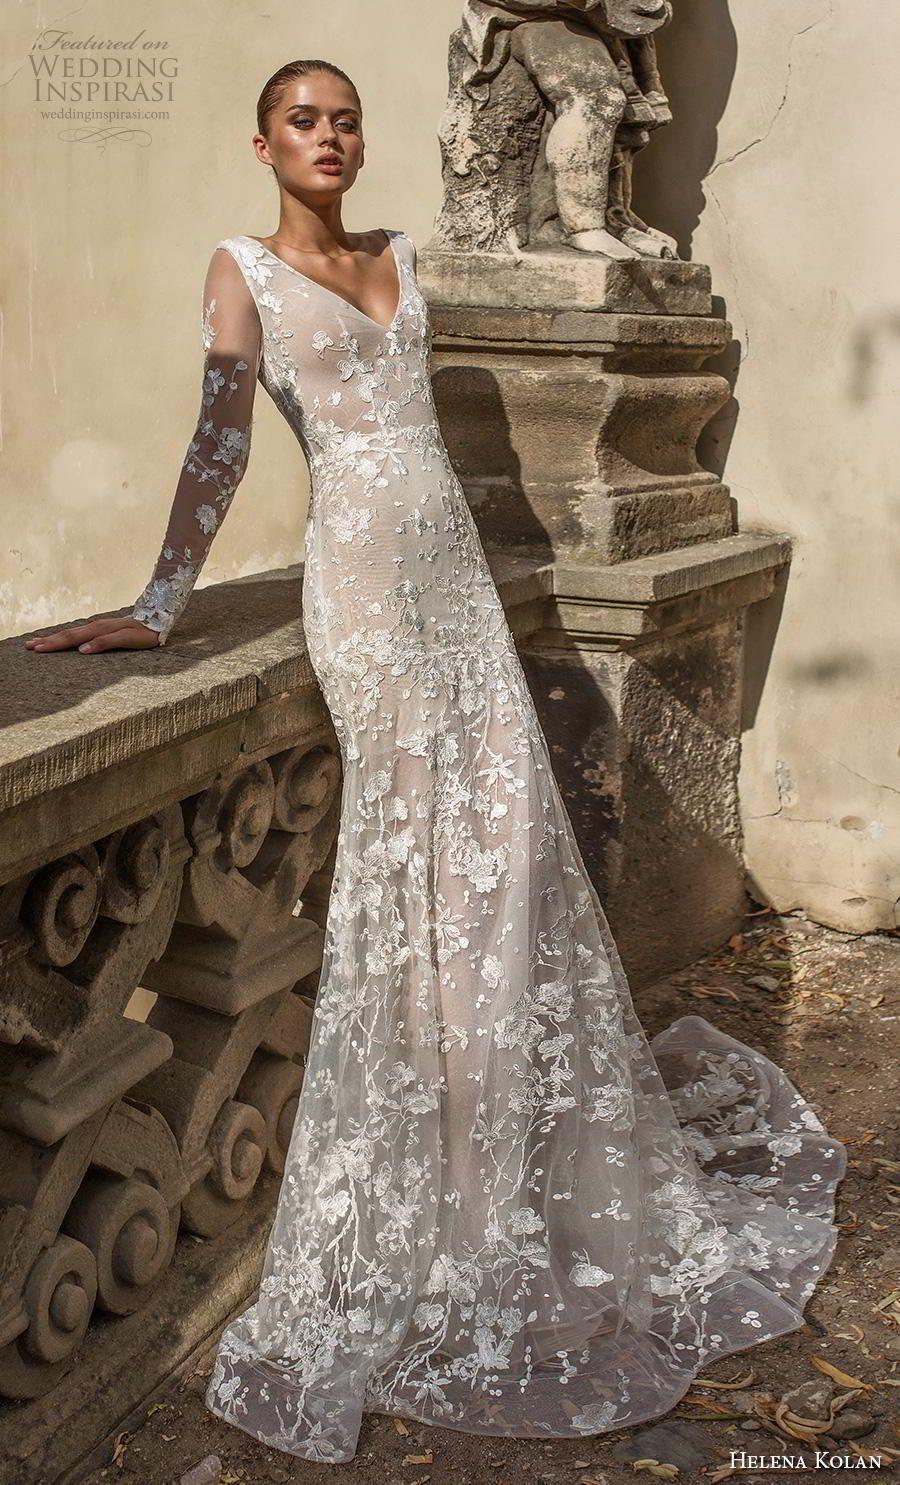 Helena kolan wedding dresses in wedding dresses